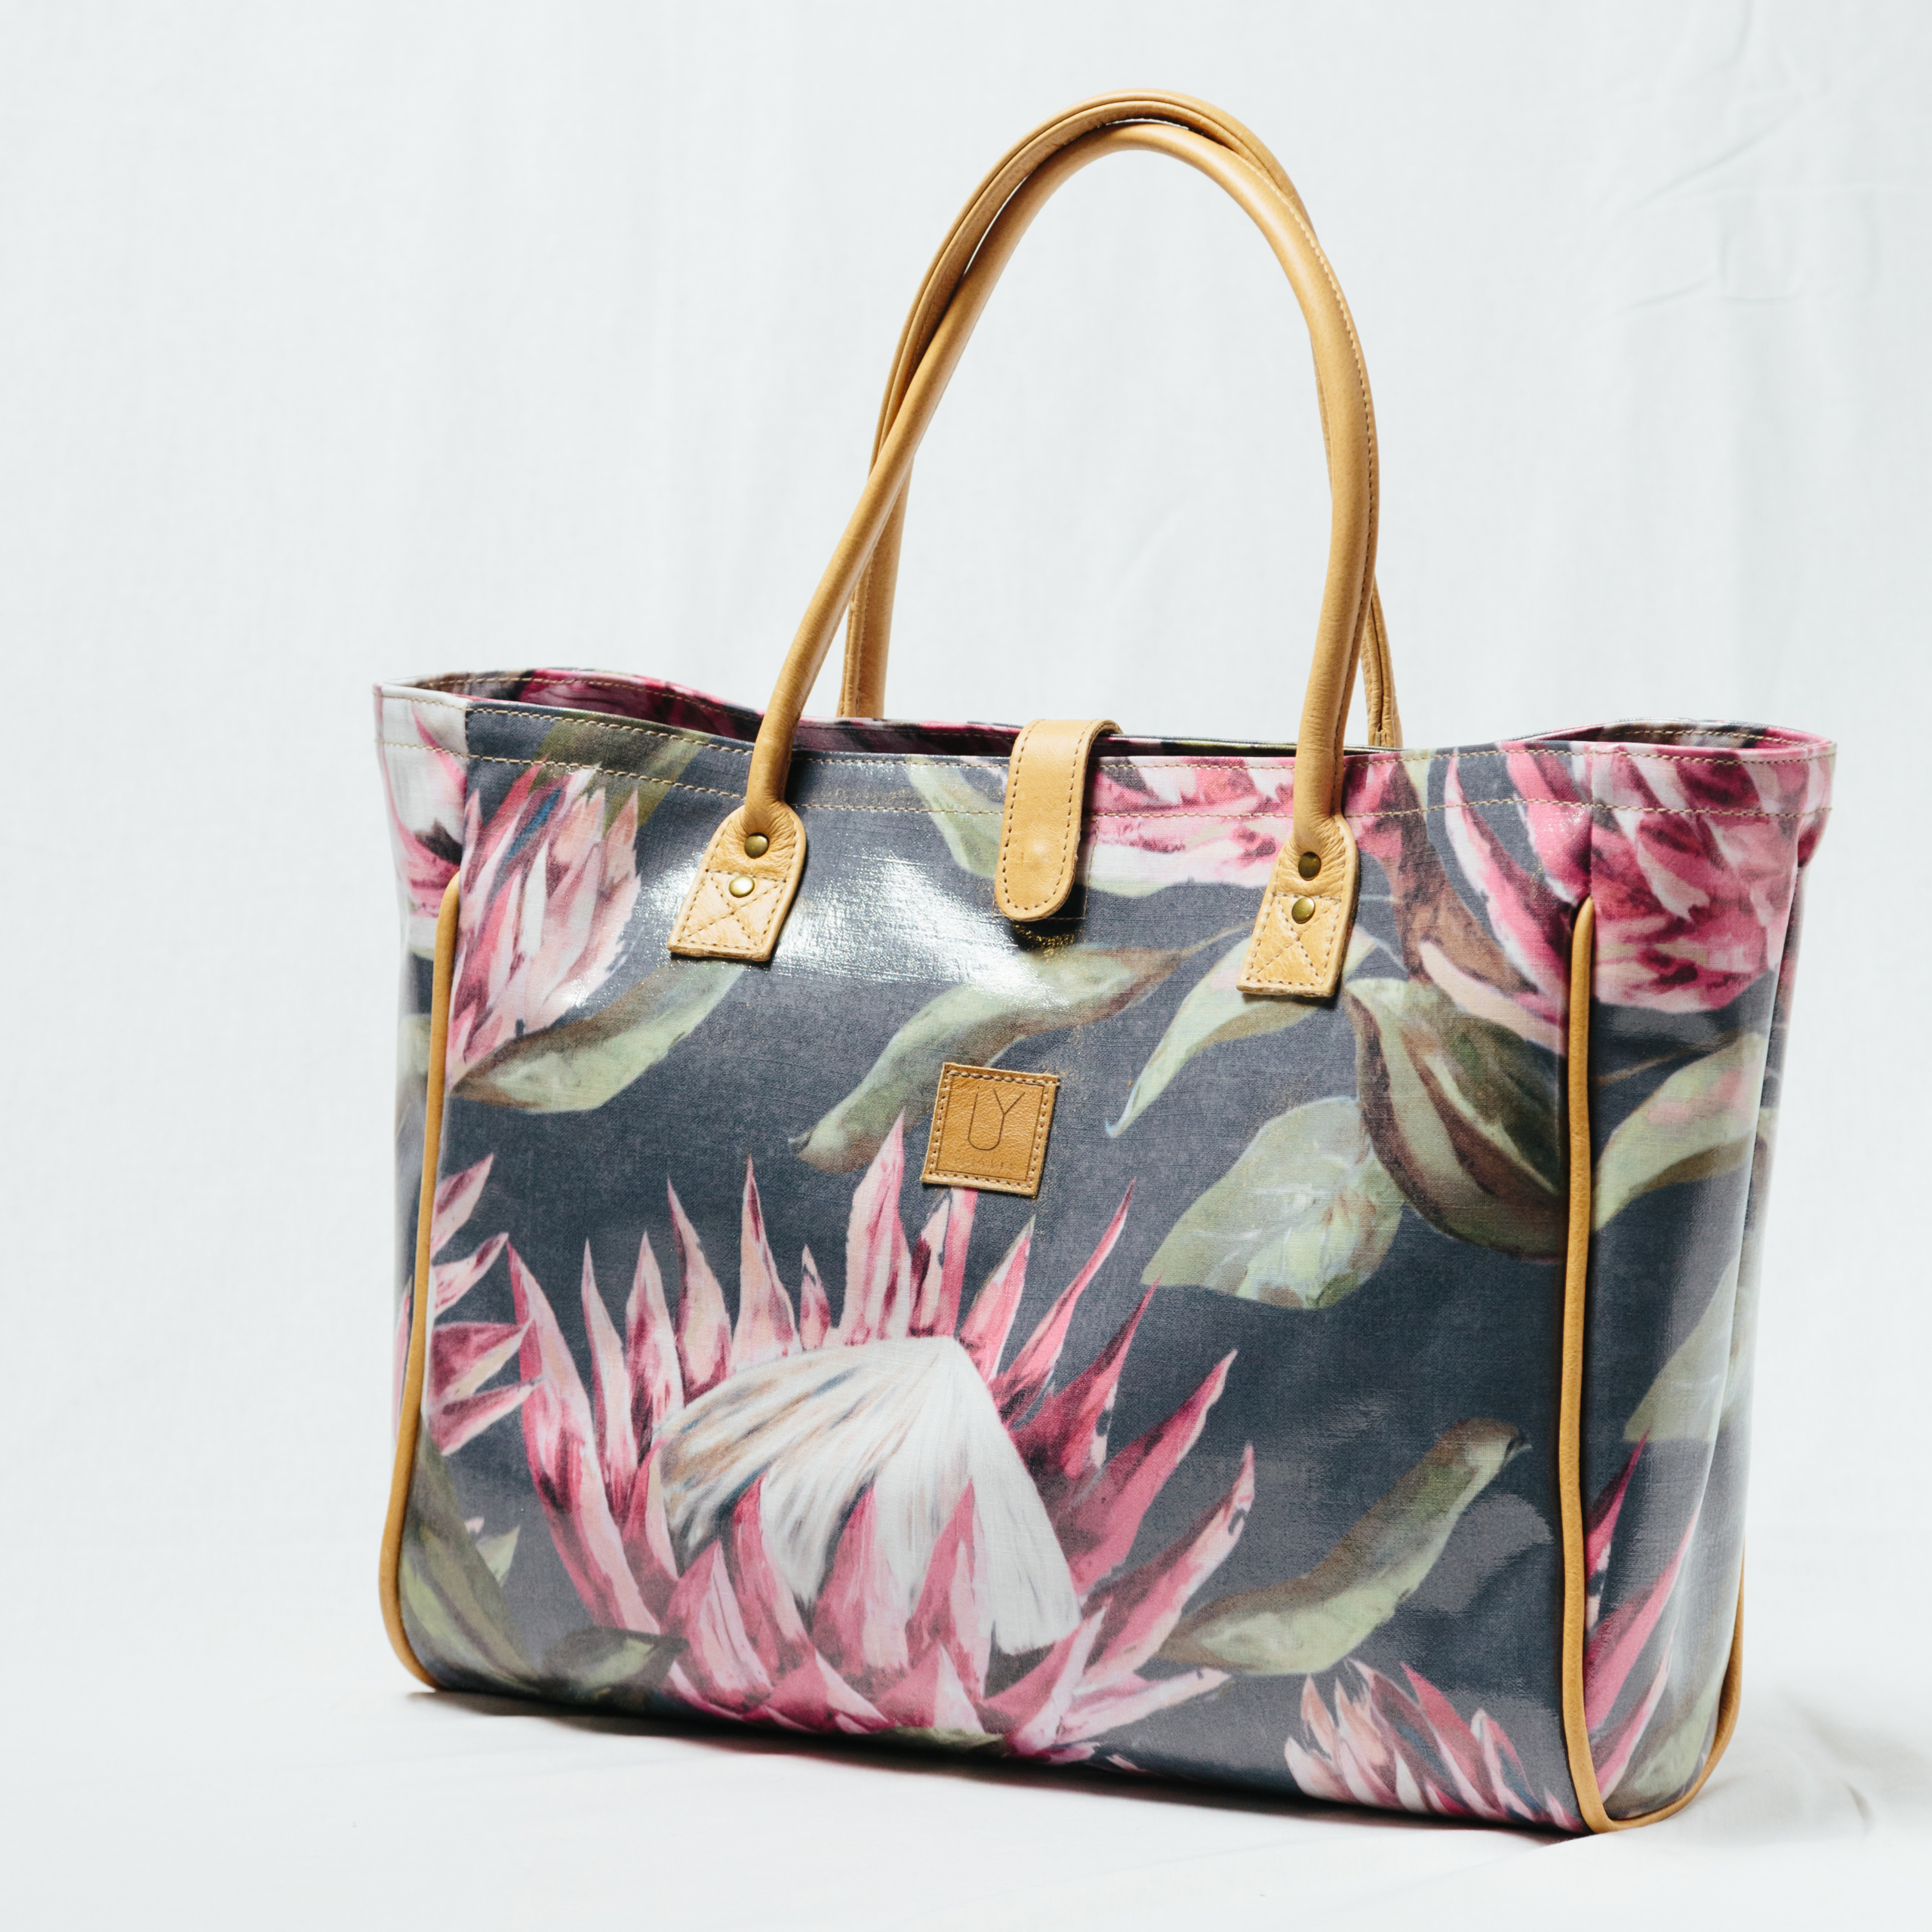 IY-Apparel-beach-bags-bright-king-grey